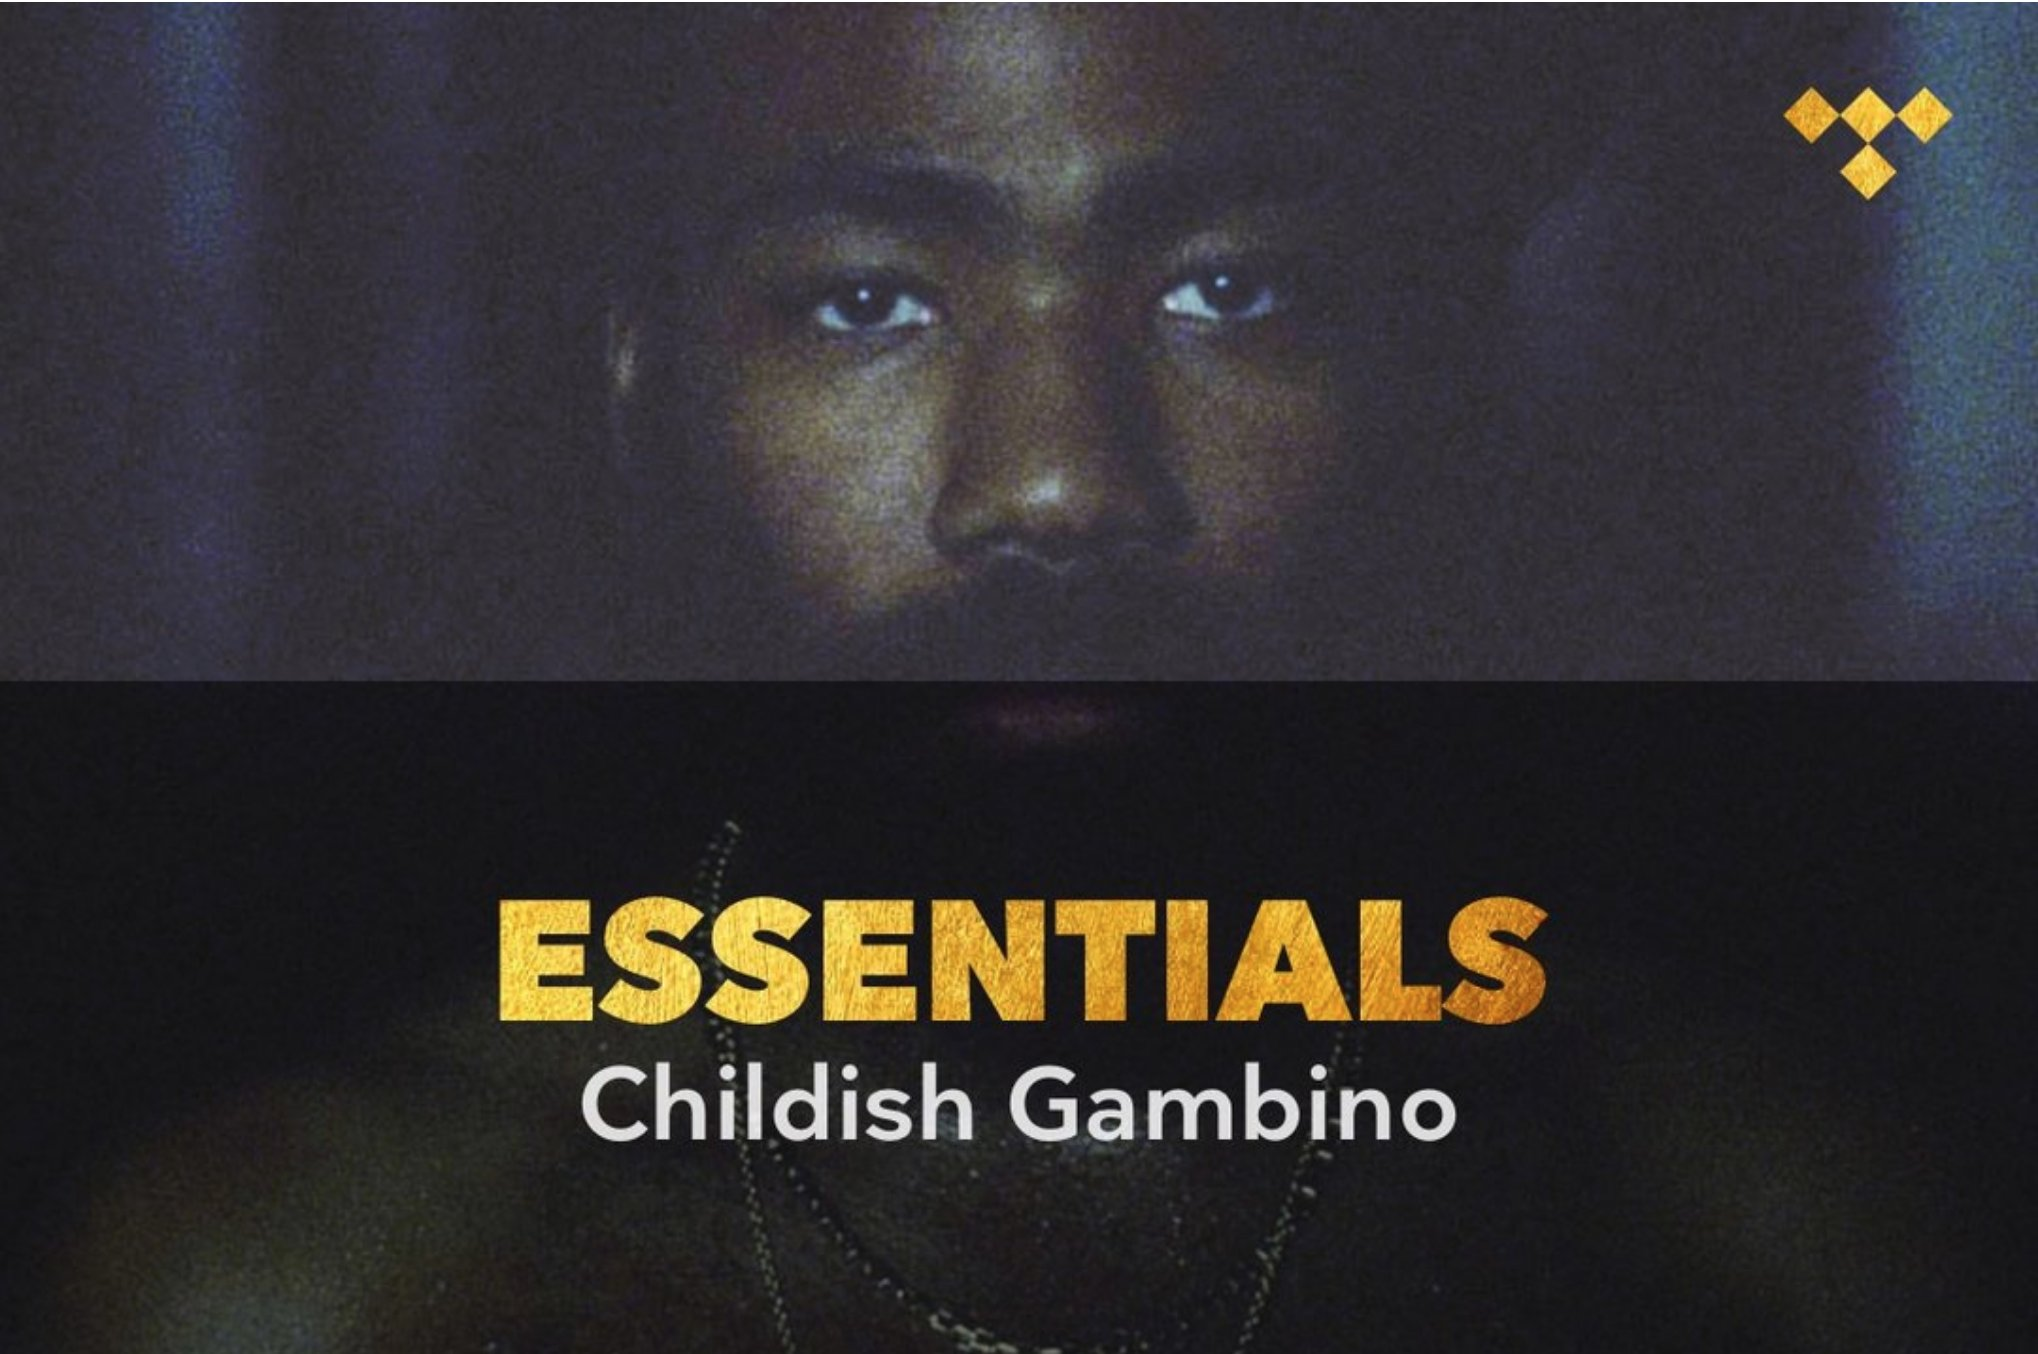 Childish Gambino Essentials https://t.co/TQphY7cx2Y #TIDAL https://t.co/LWAwSTtIYU